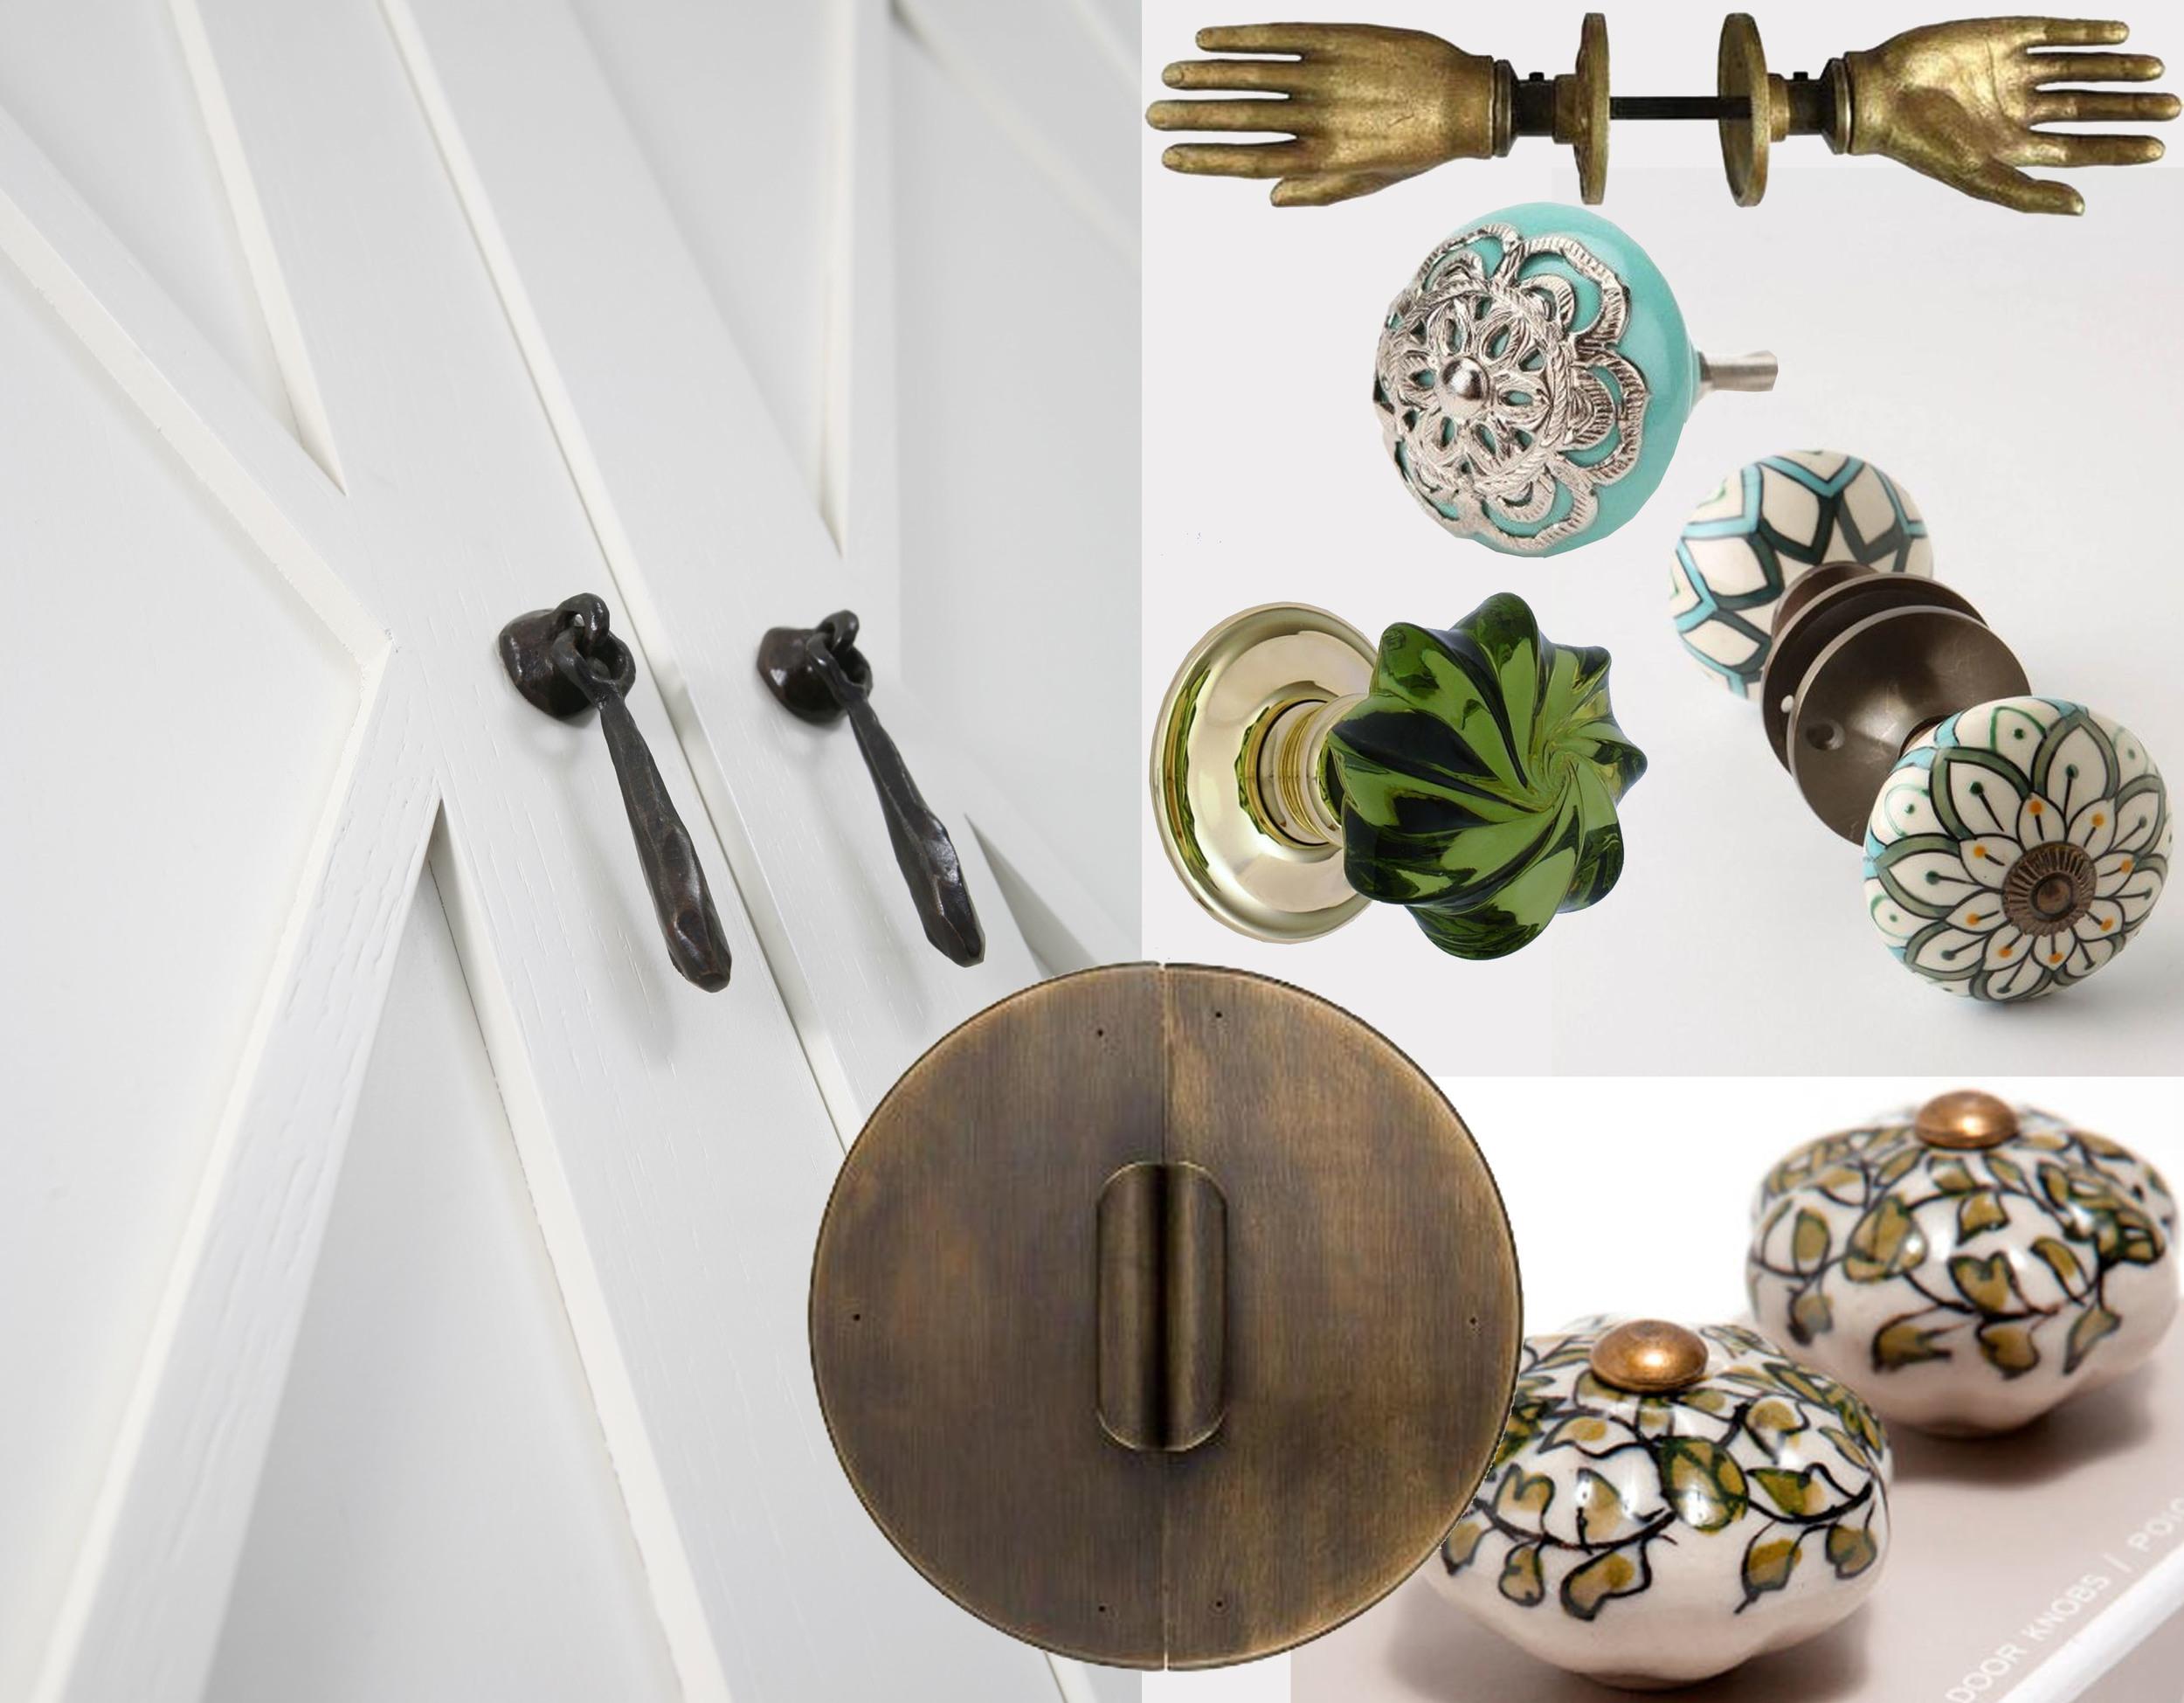 inspiration door knobs on Pinterest